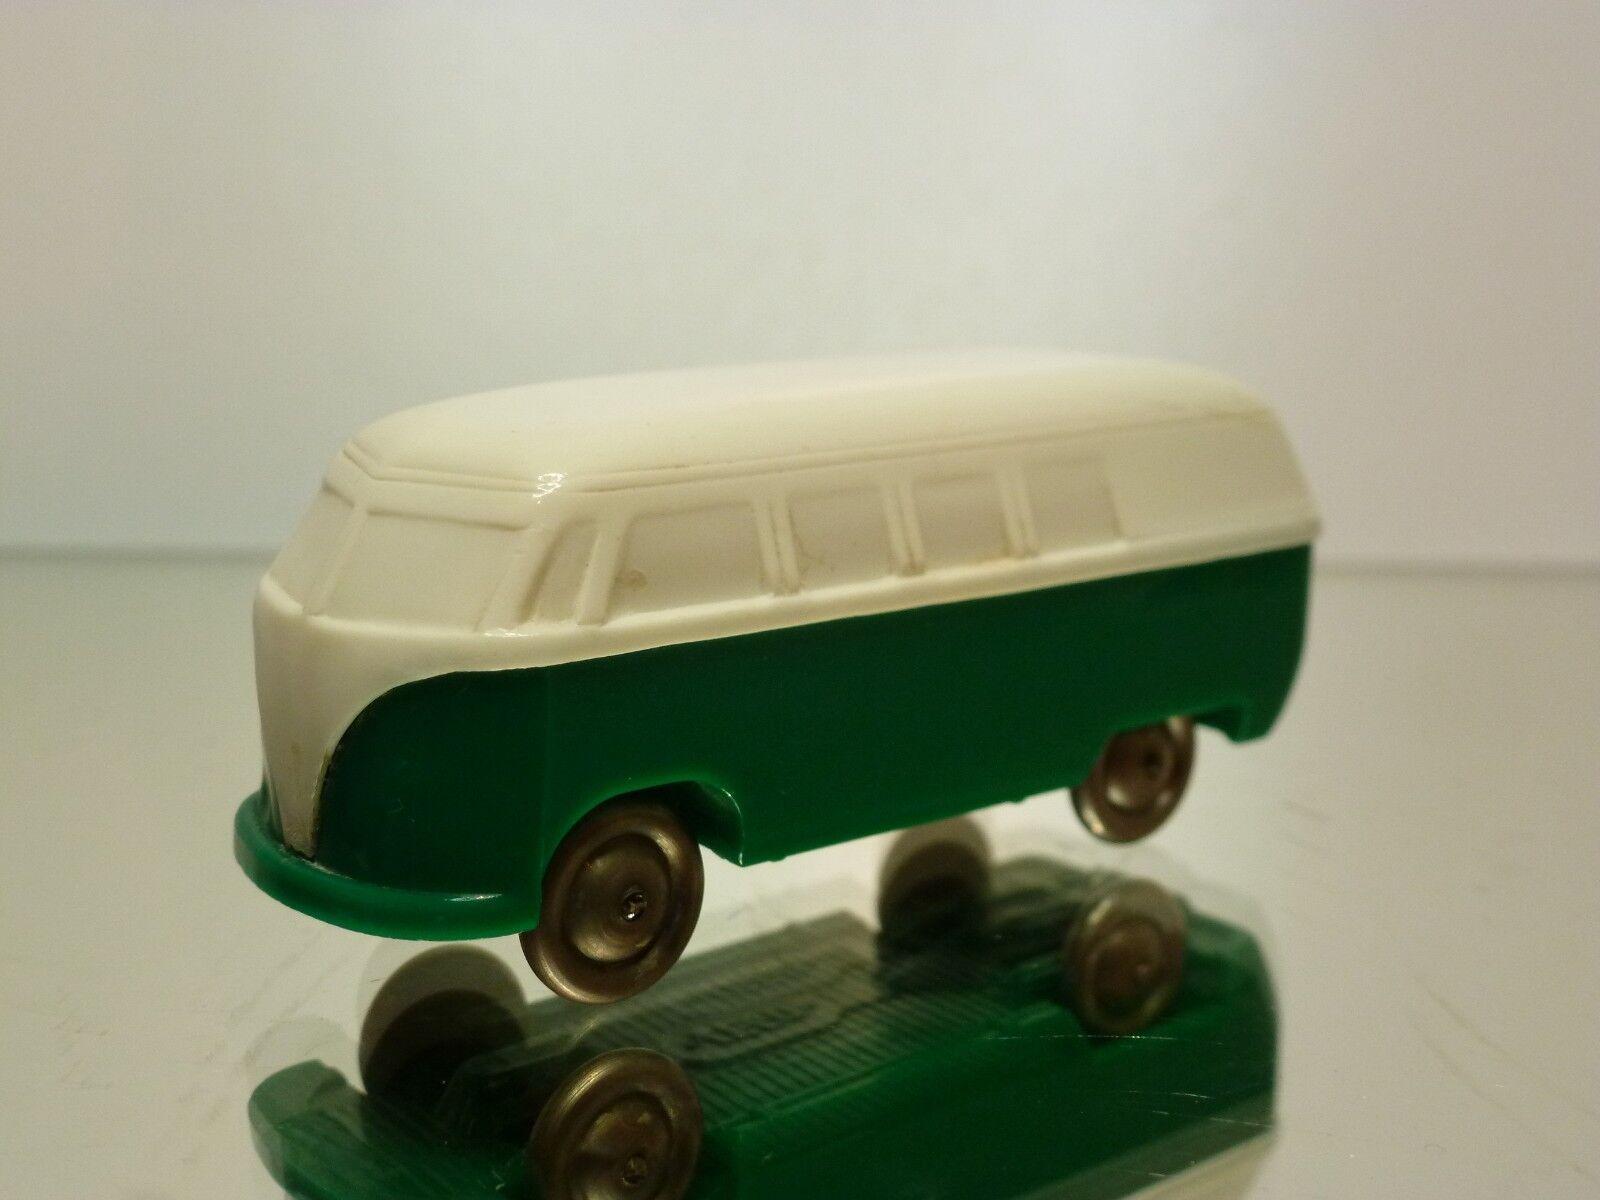 LEGO VW VOLSWAGEN T1 BUS UNVERGLASST - GREEN WHITE L6.0cm  EXTREMELY RARE